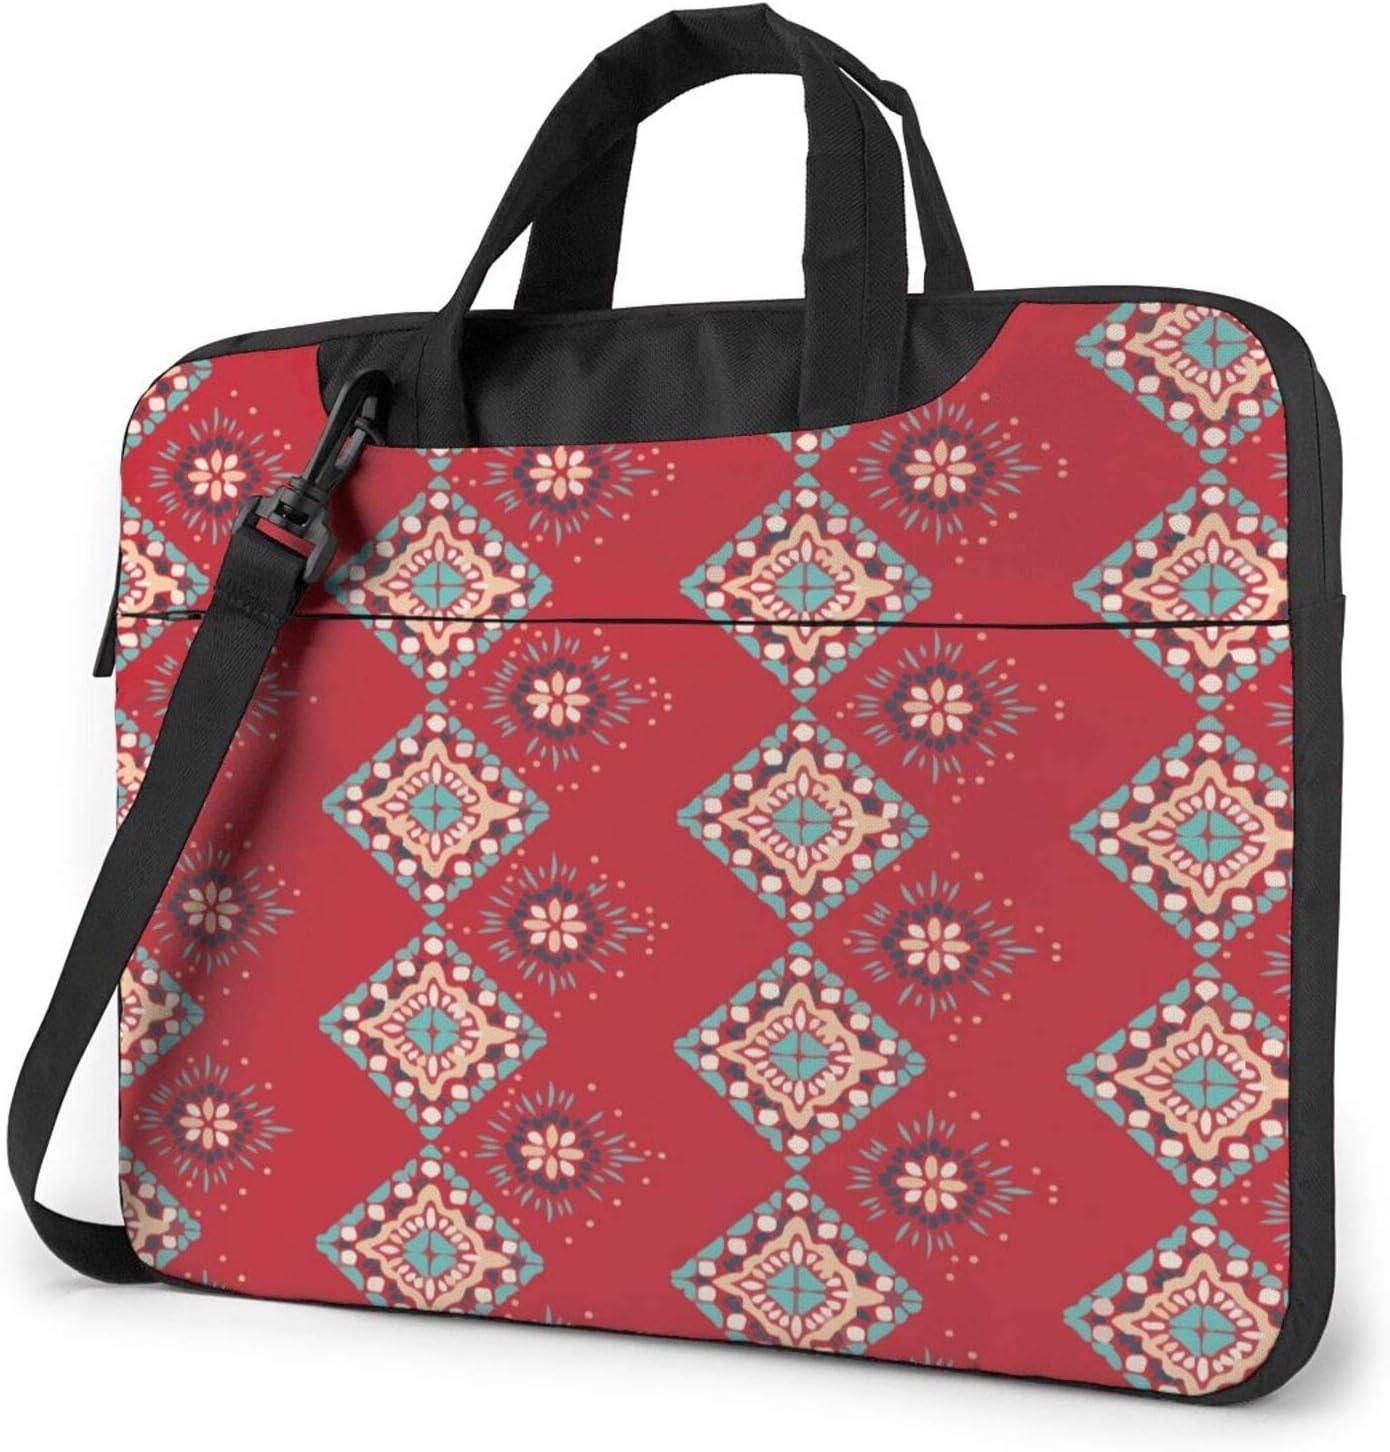 Laptop Messenger Folklore Aztec Indian Gypsy Shoulder Bag Briefcase Office Laptop Sleeve Case Luggage for Men Women 13 Inch